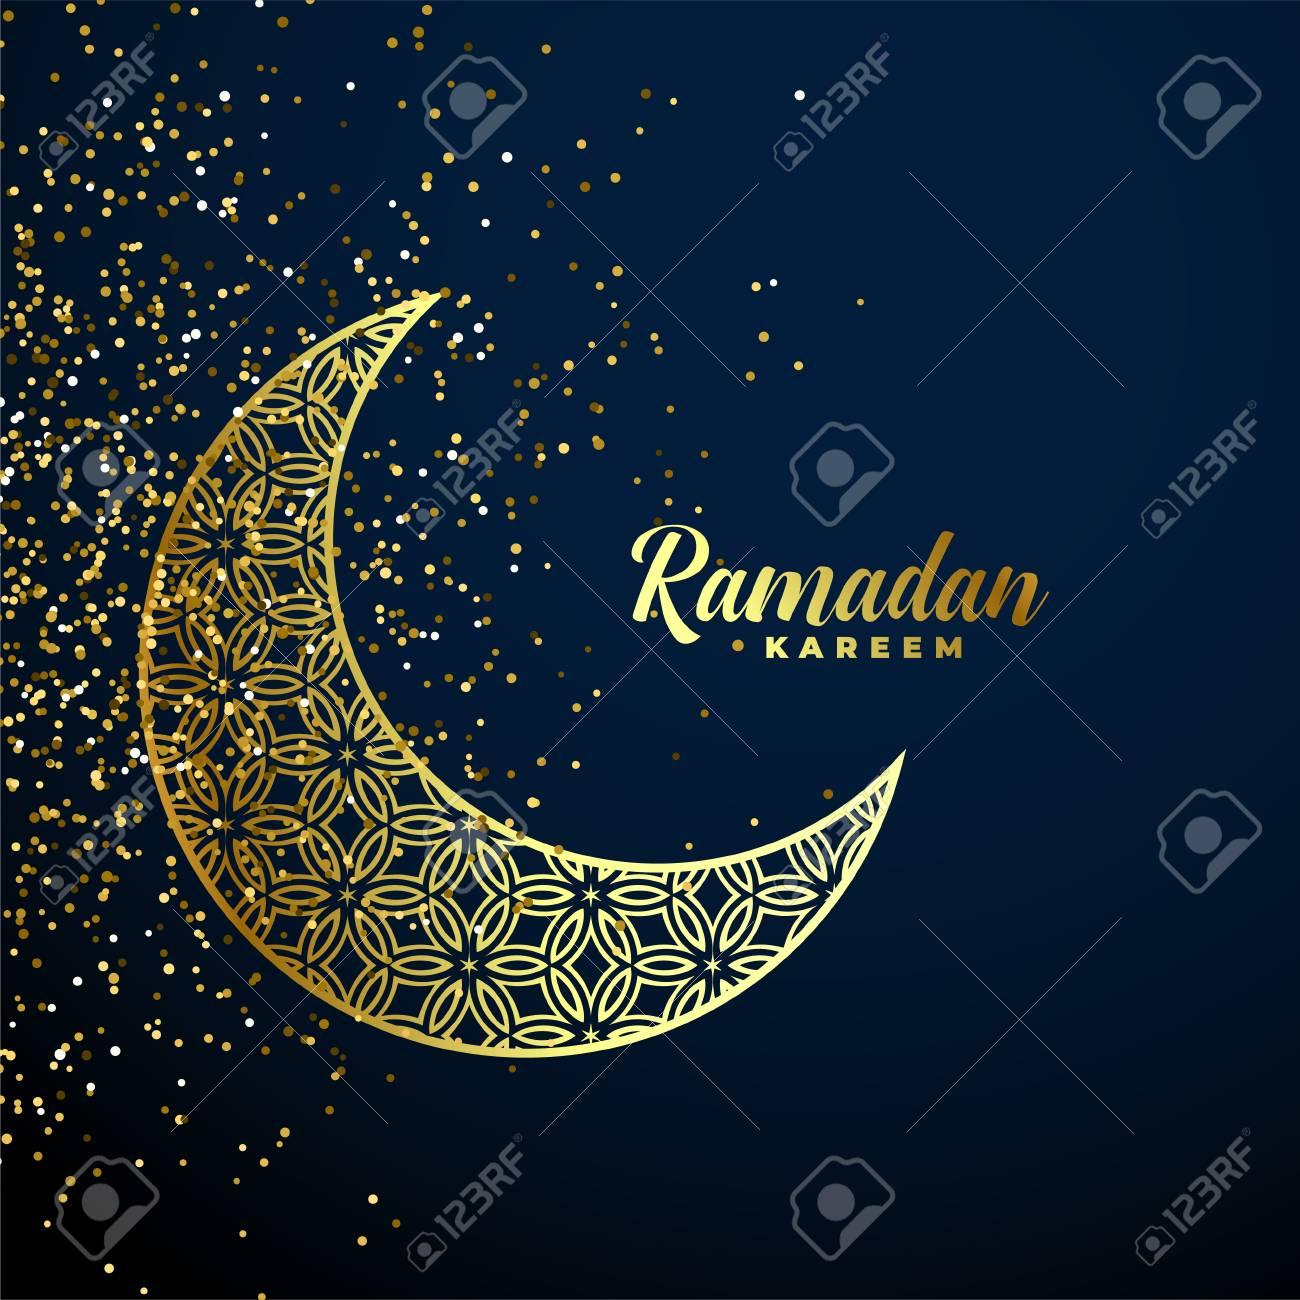 golden decorative moon with glitter ramadan kareem background - 120097429